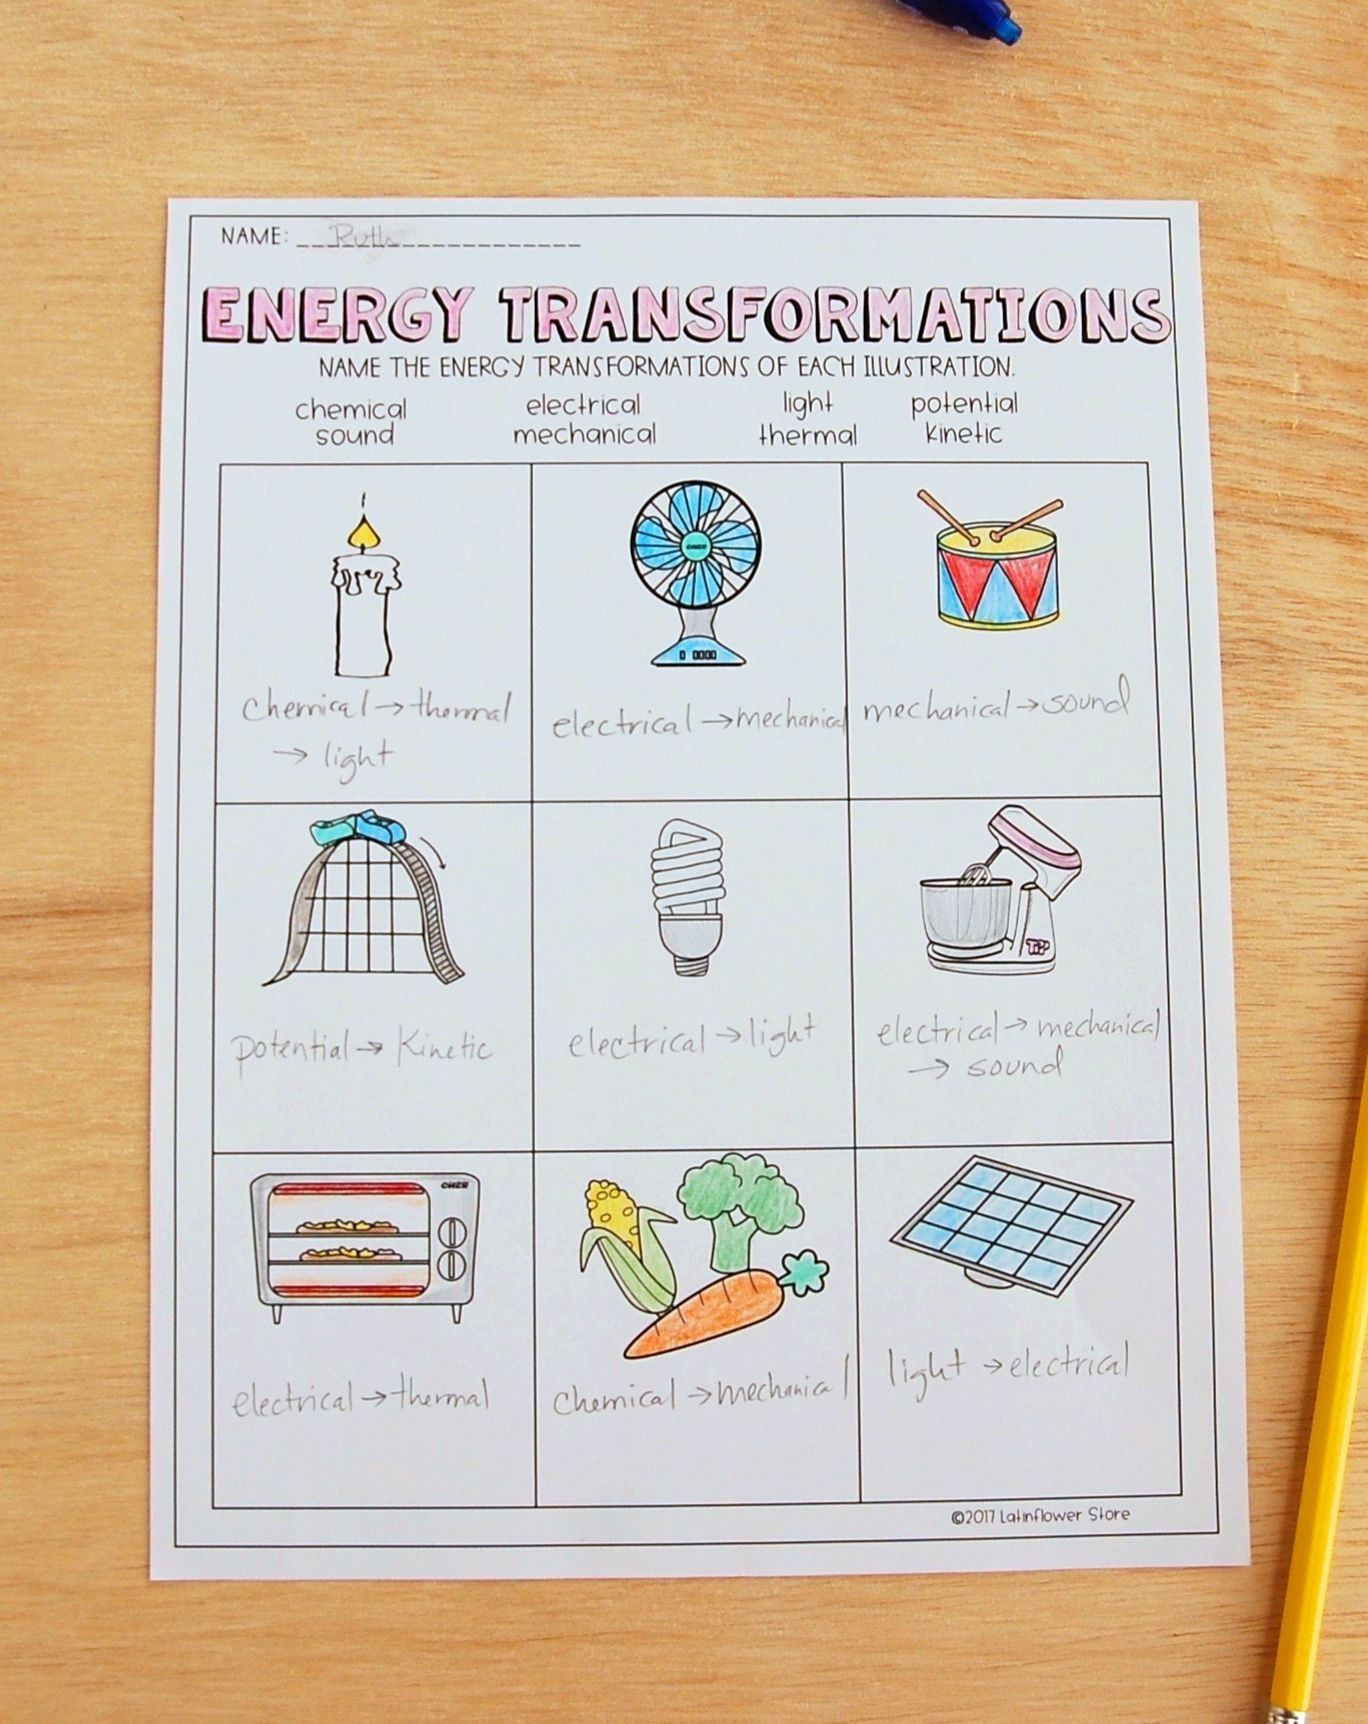 Energy Transformations Worksheet   Energy transformations [ 1724 x 1368 Pixel ]